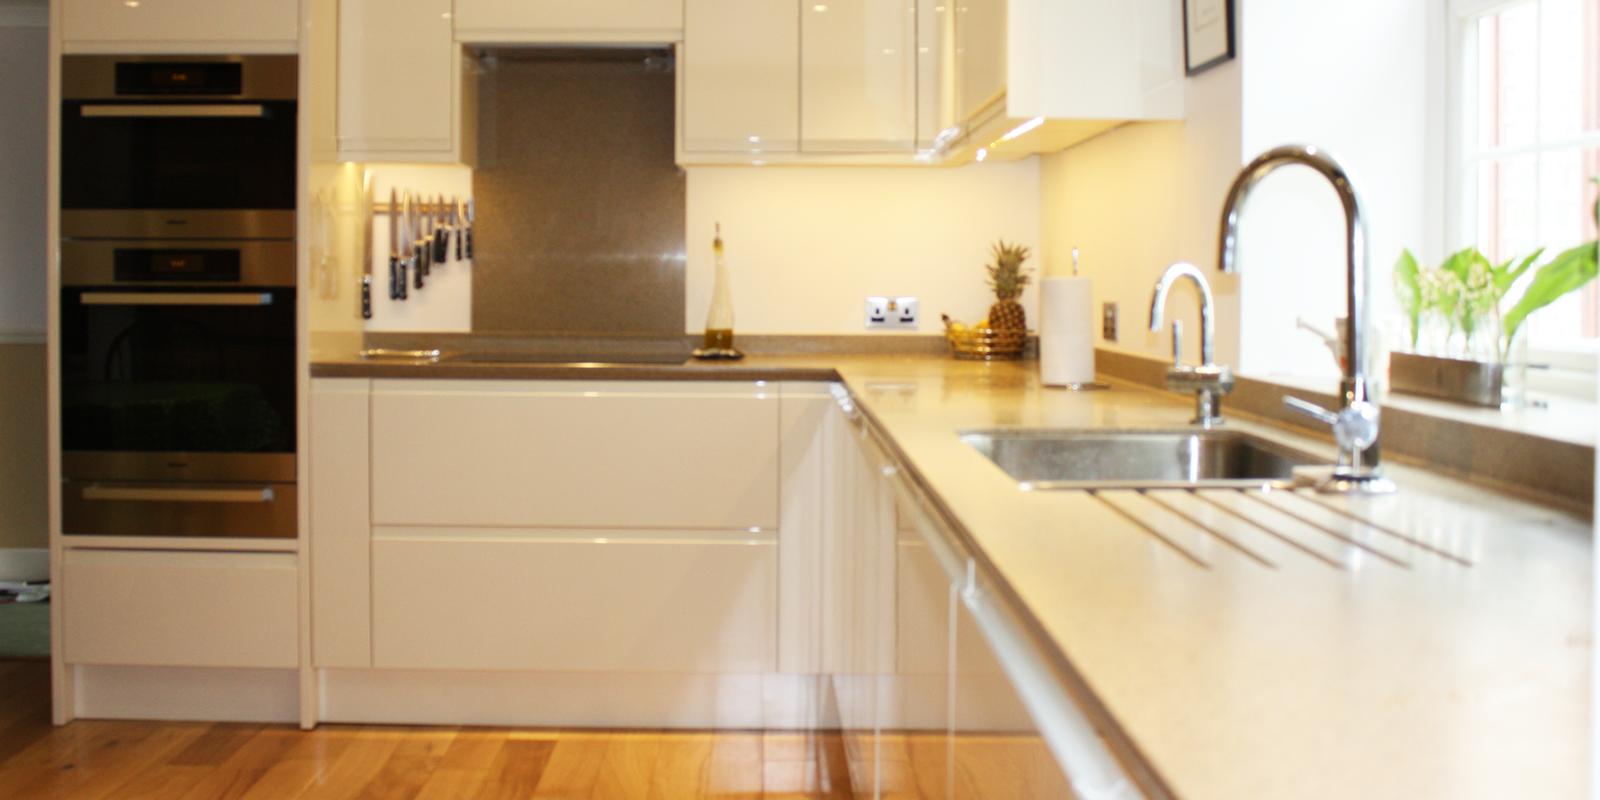 Kitchen With Oak And Beige Floor